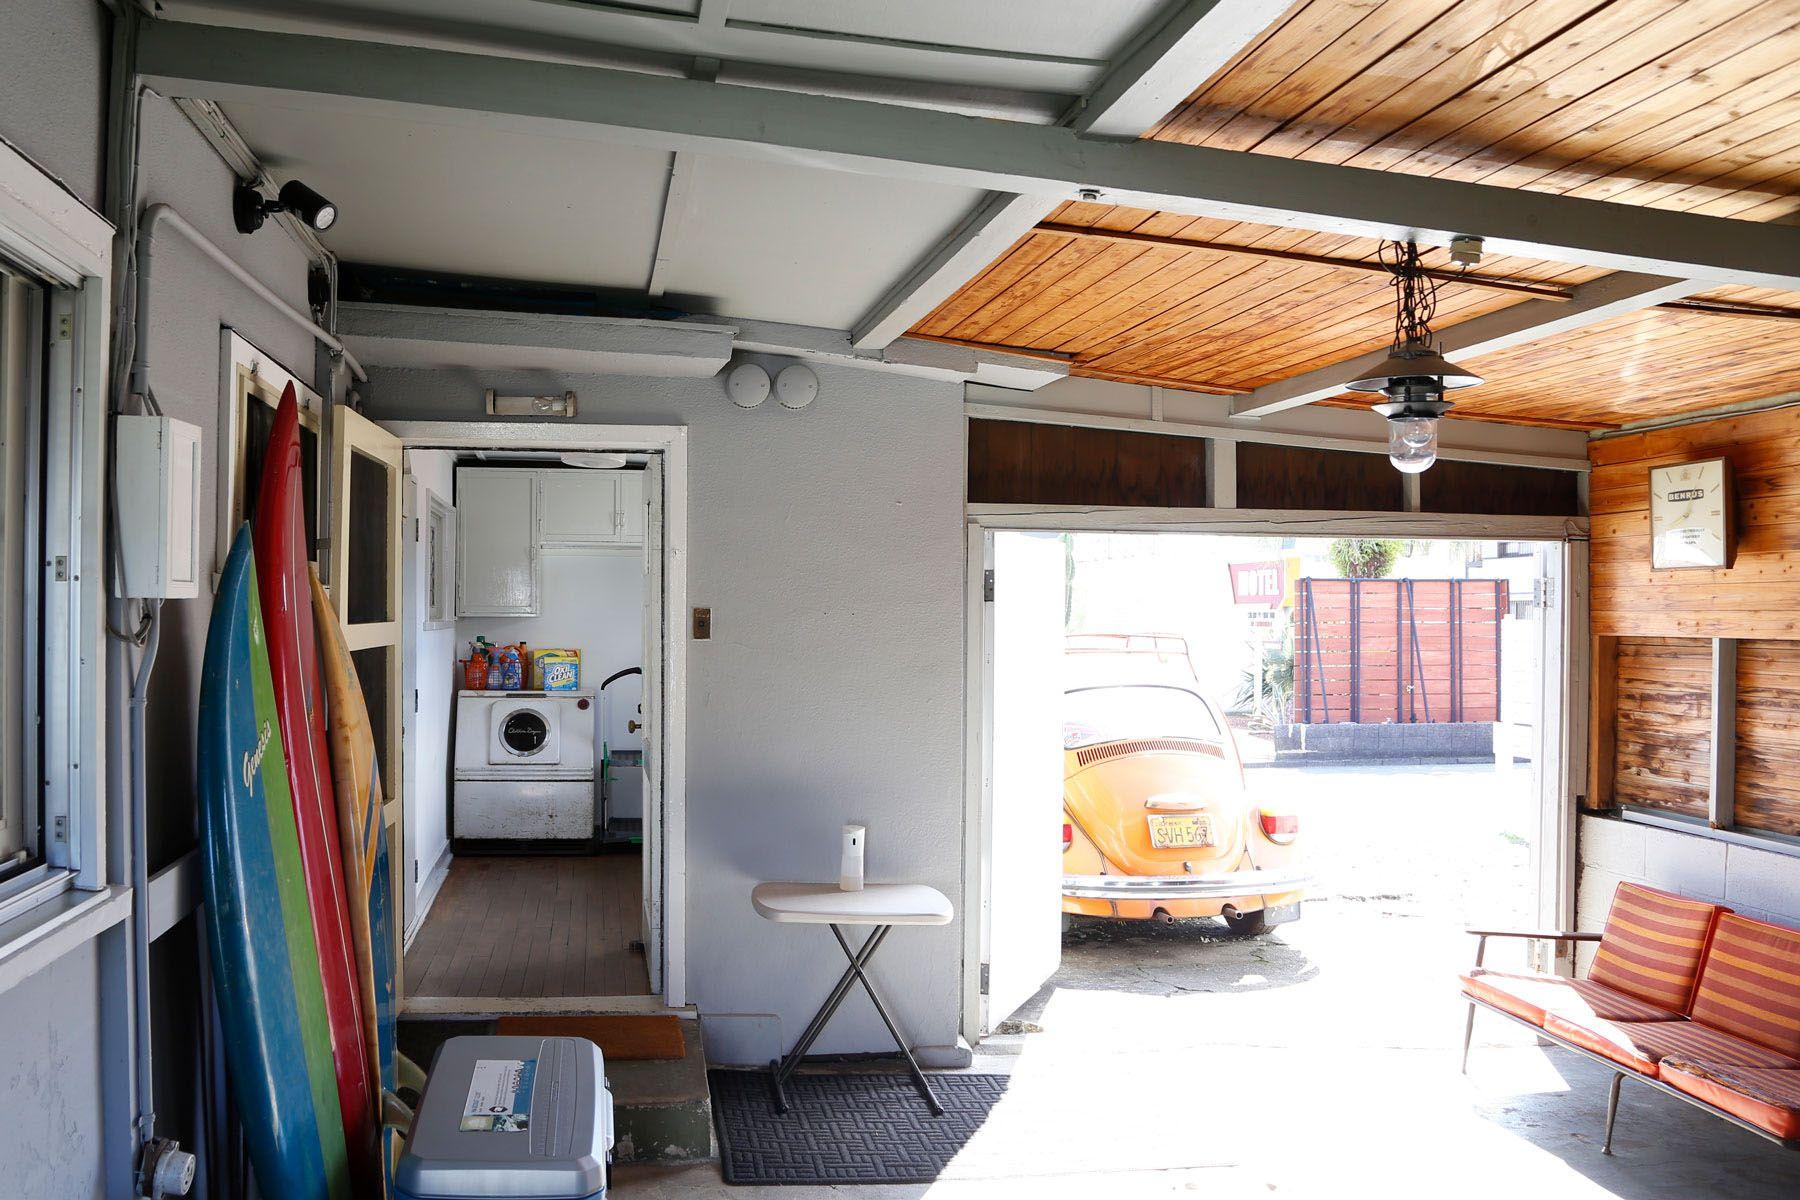 Del Mar Studio (デルマースタジオ) /FUJIYAMA LOCATION SERVICES